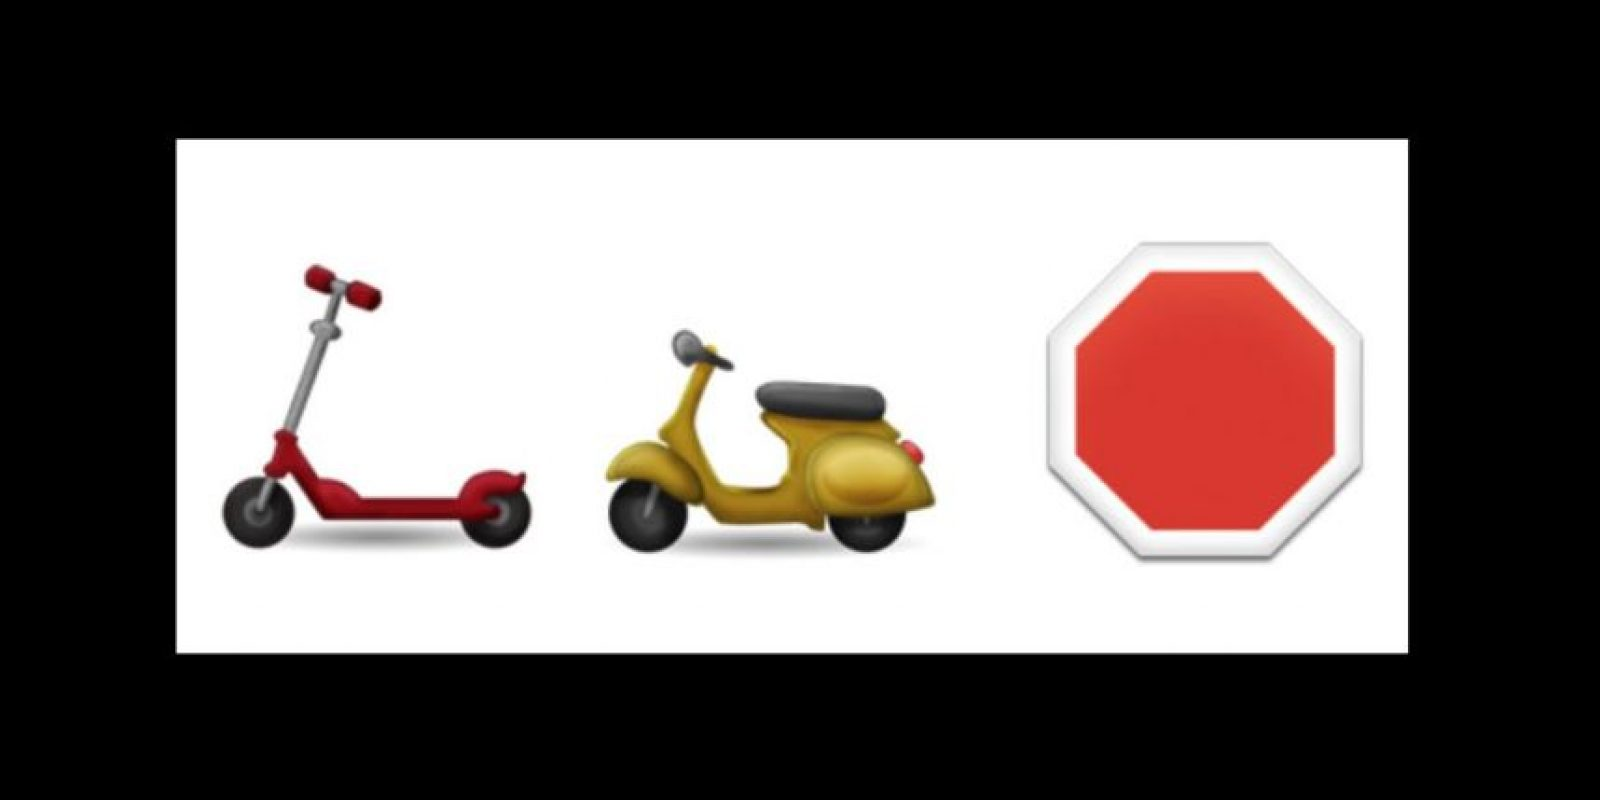 Nuevos transportes Foto:Emojipedia